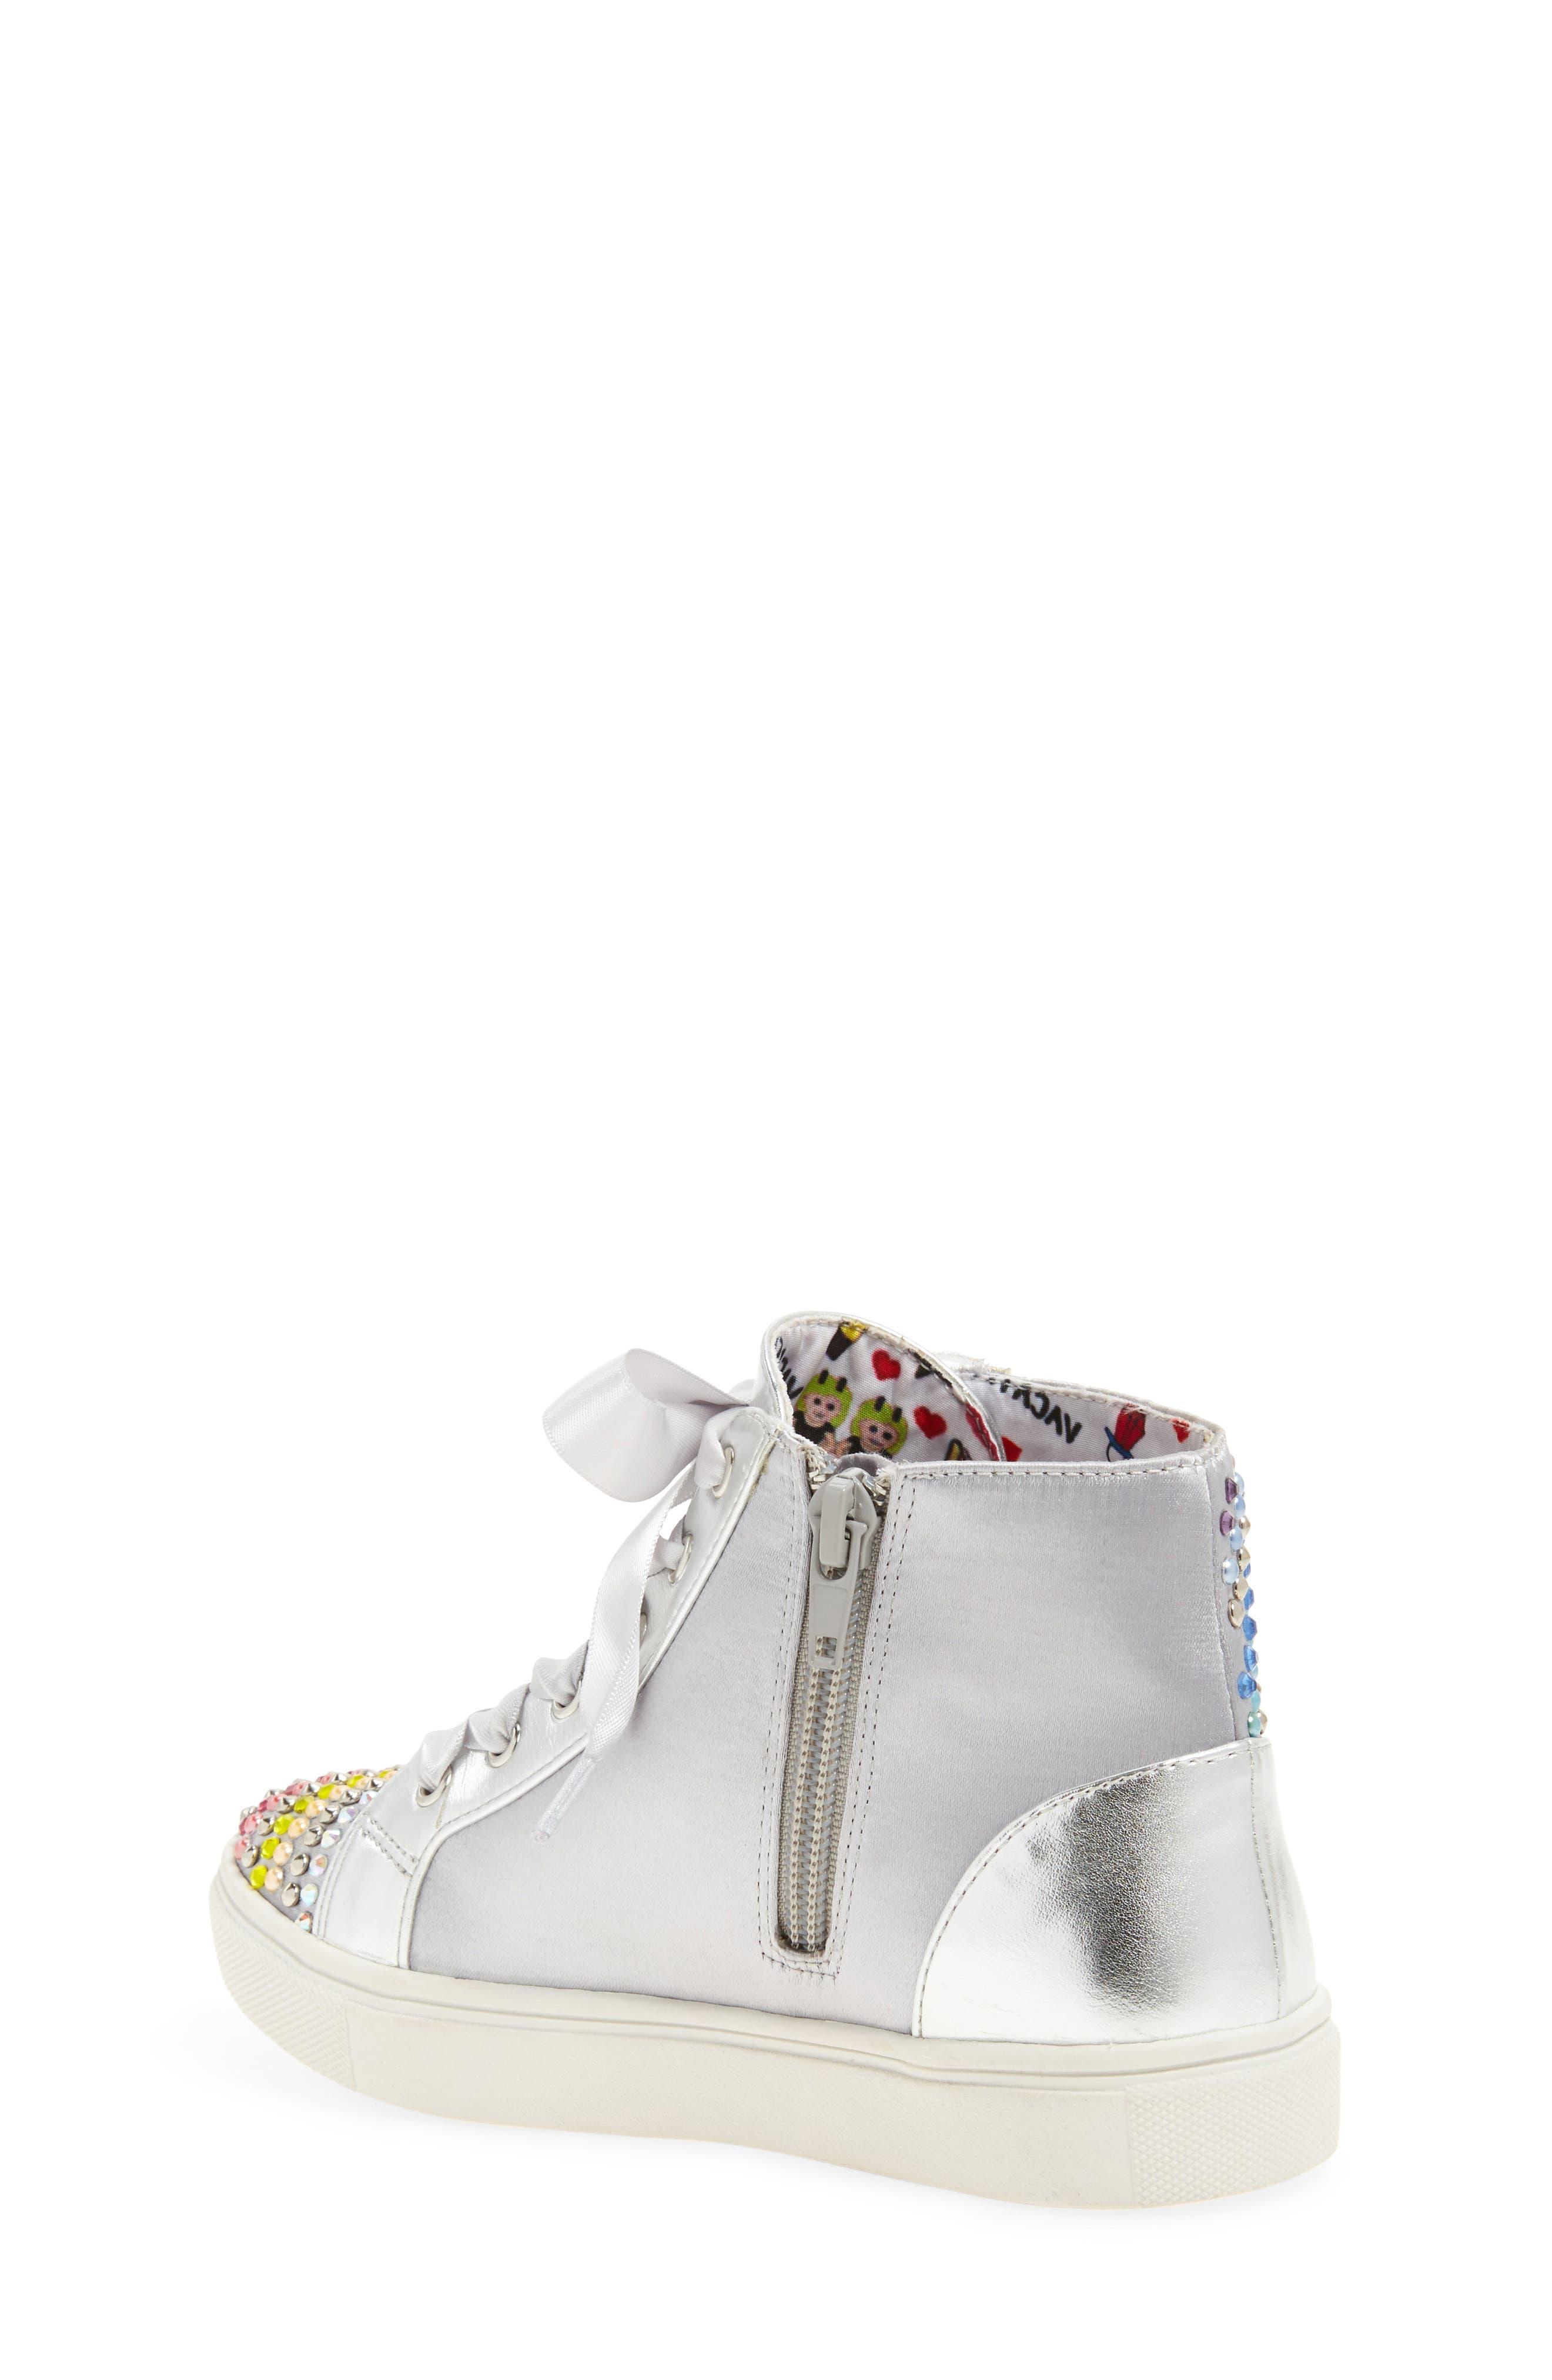 Rainey Rainbow Studded High Top Sneaker,                             Alternate thumbnail 2, color,                             040